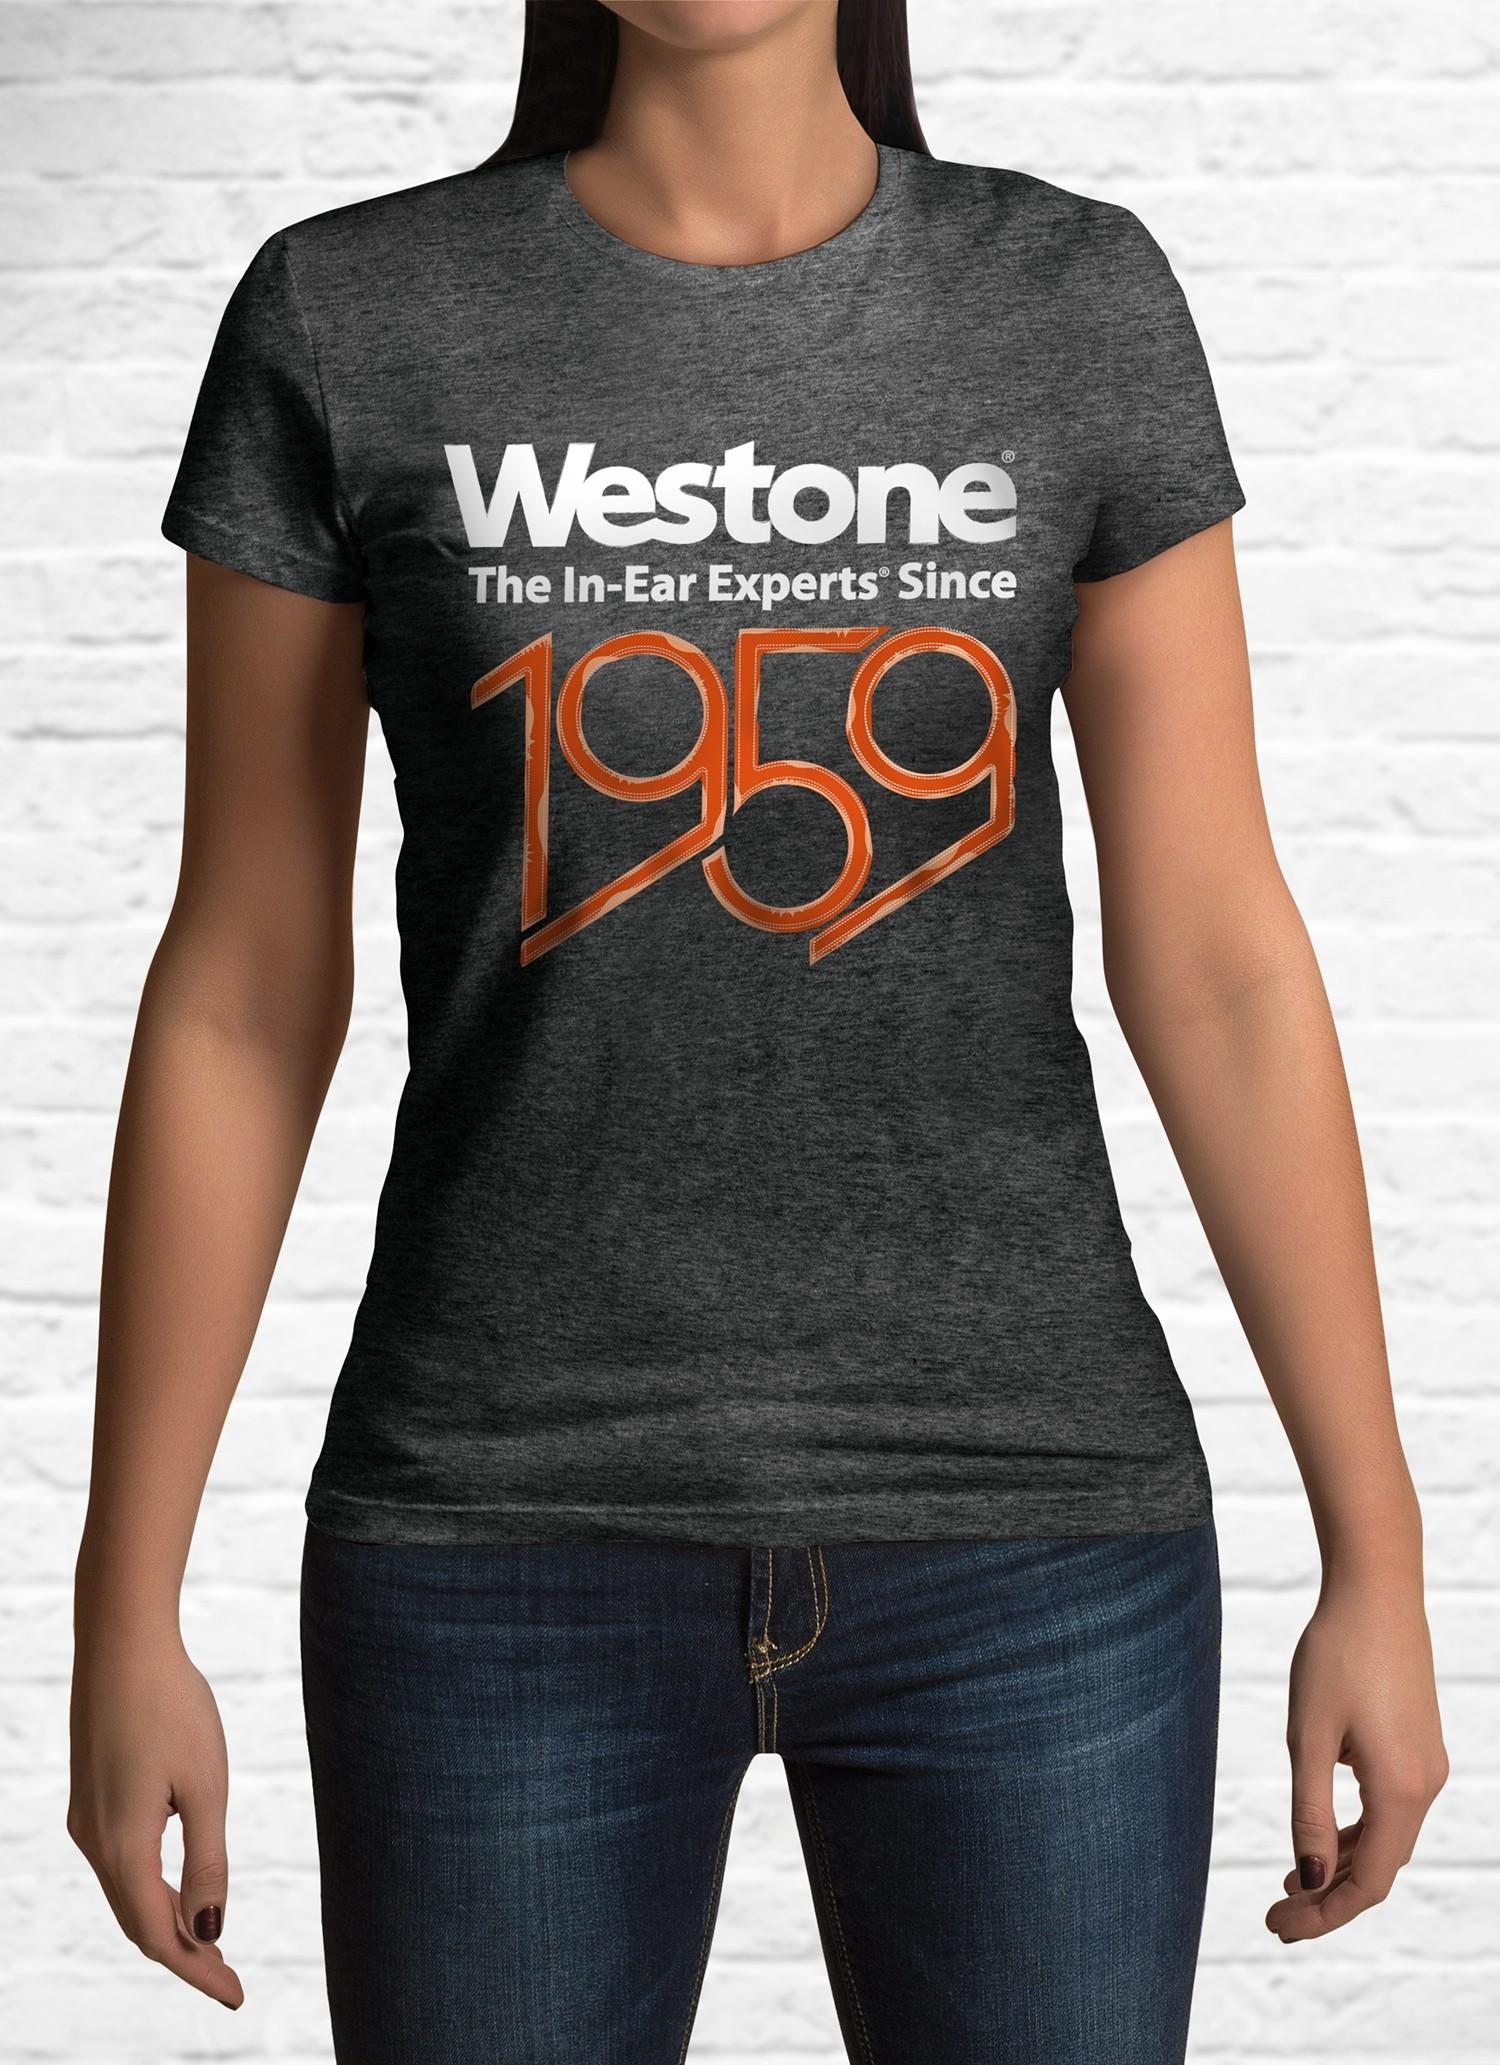 Westone Since 1959 T-Shirt - Womens, 2XL, Charcoal